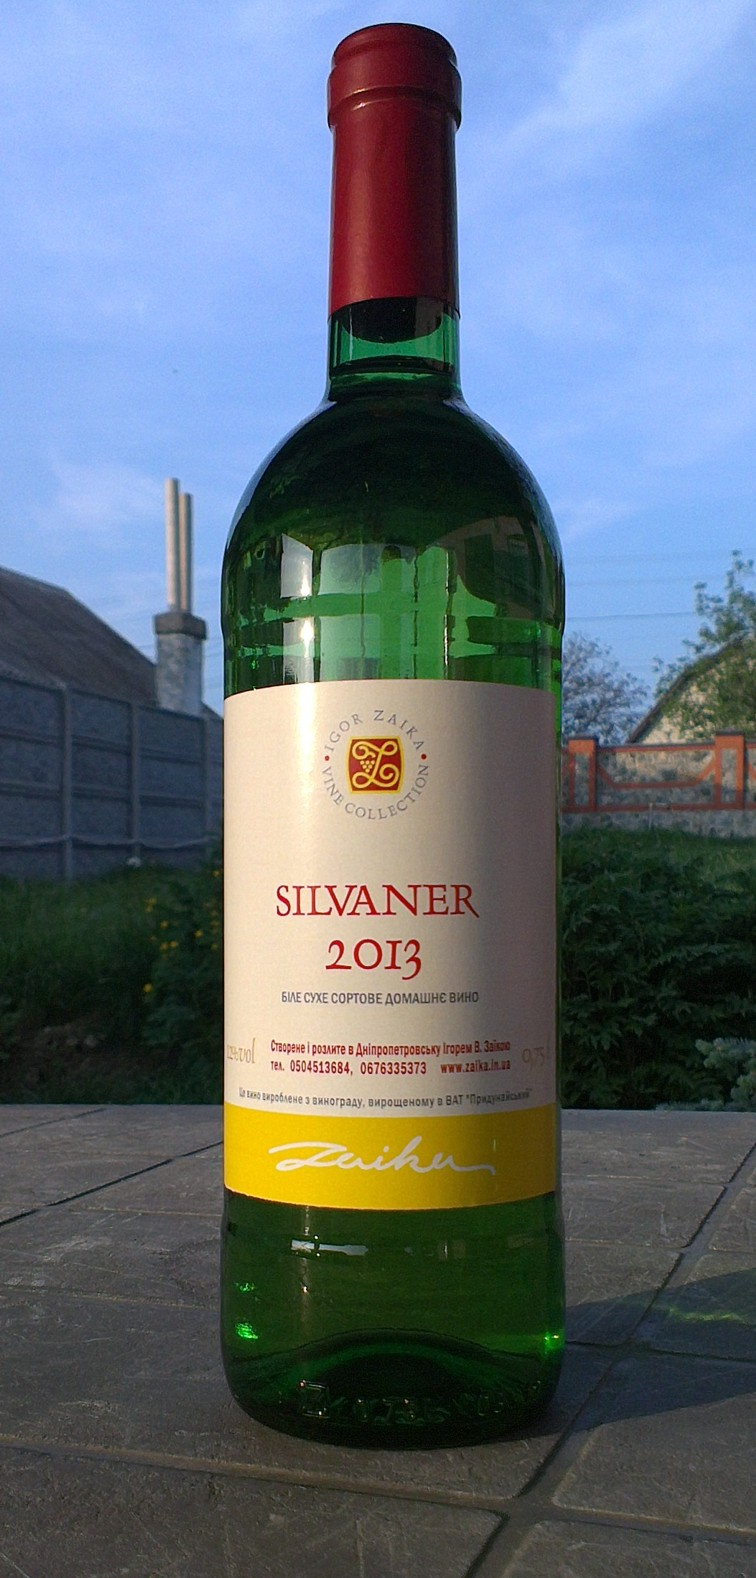 Silvaner 2014